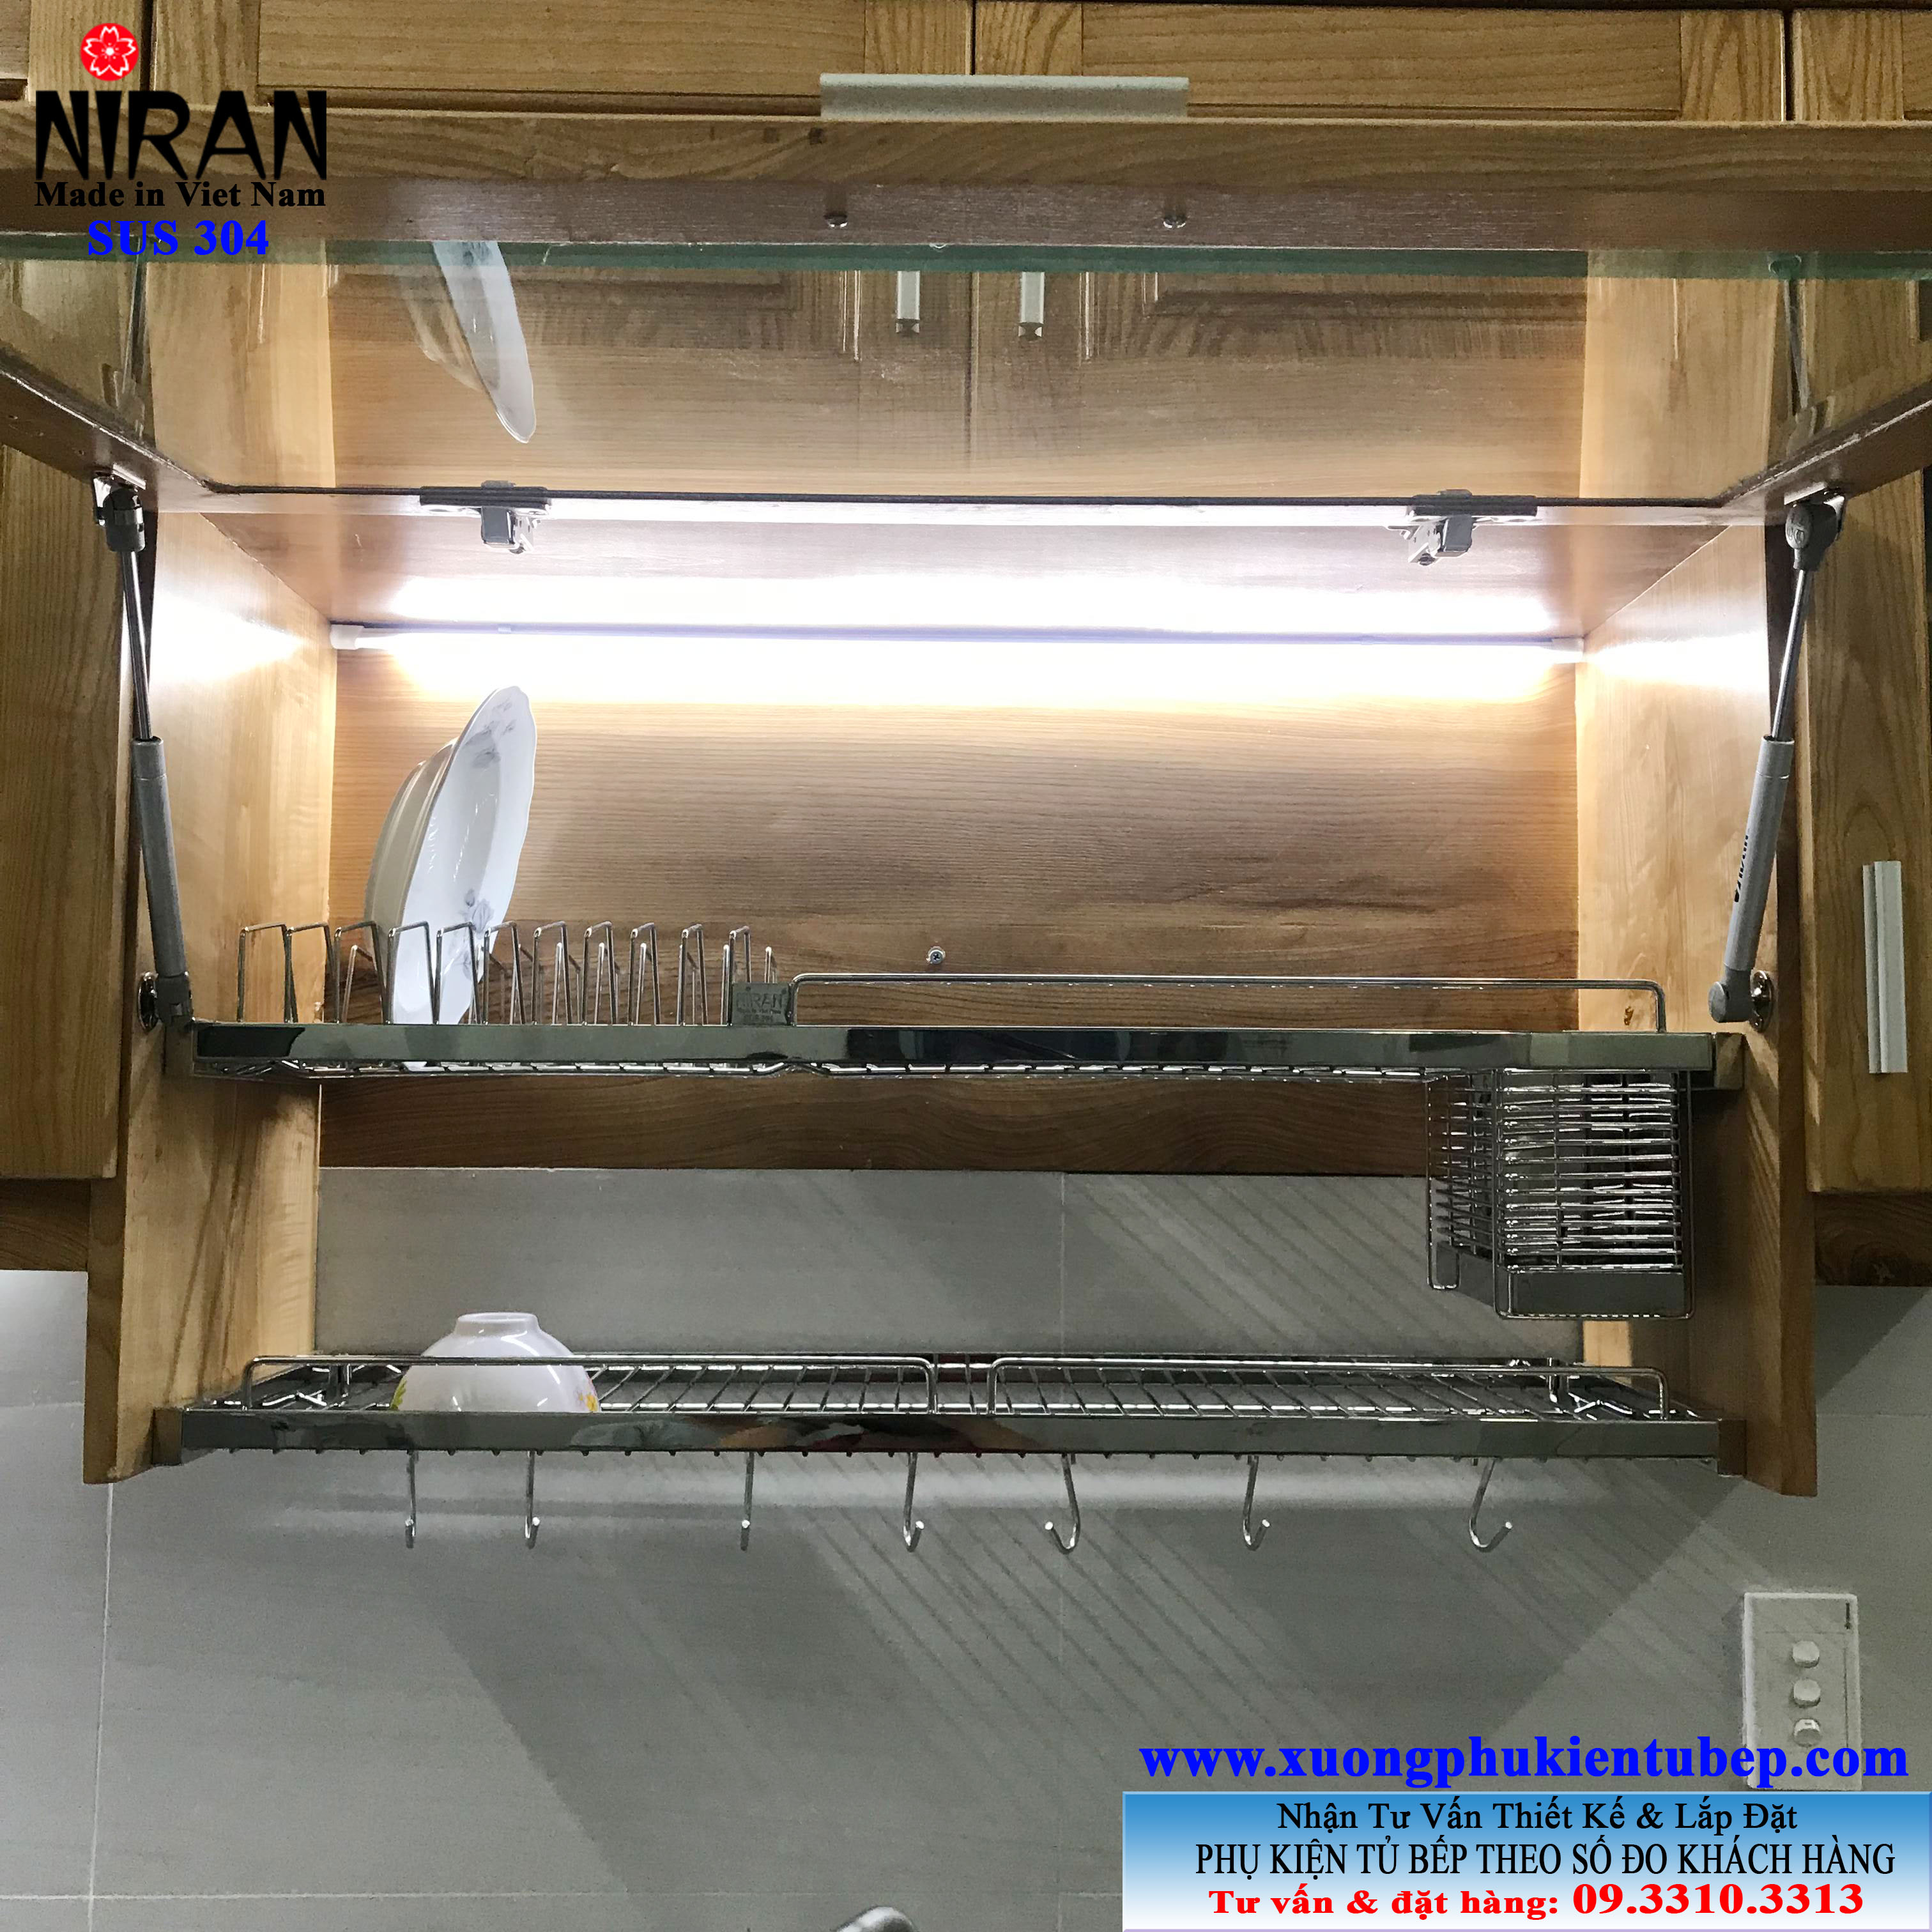 Ke chen am tu tren 2 tang inox 304 Niran NR0113